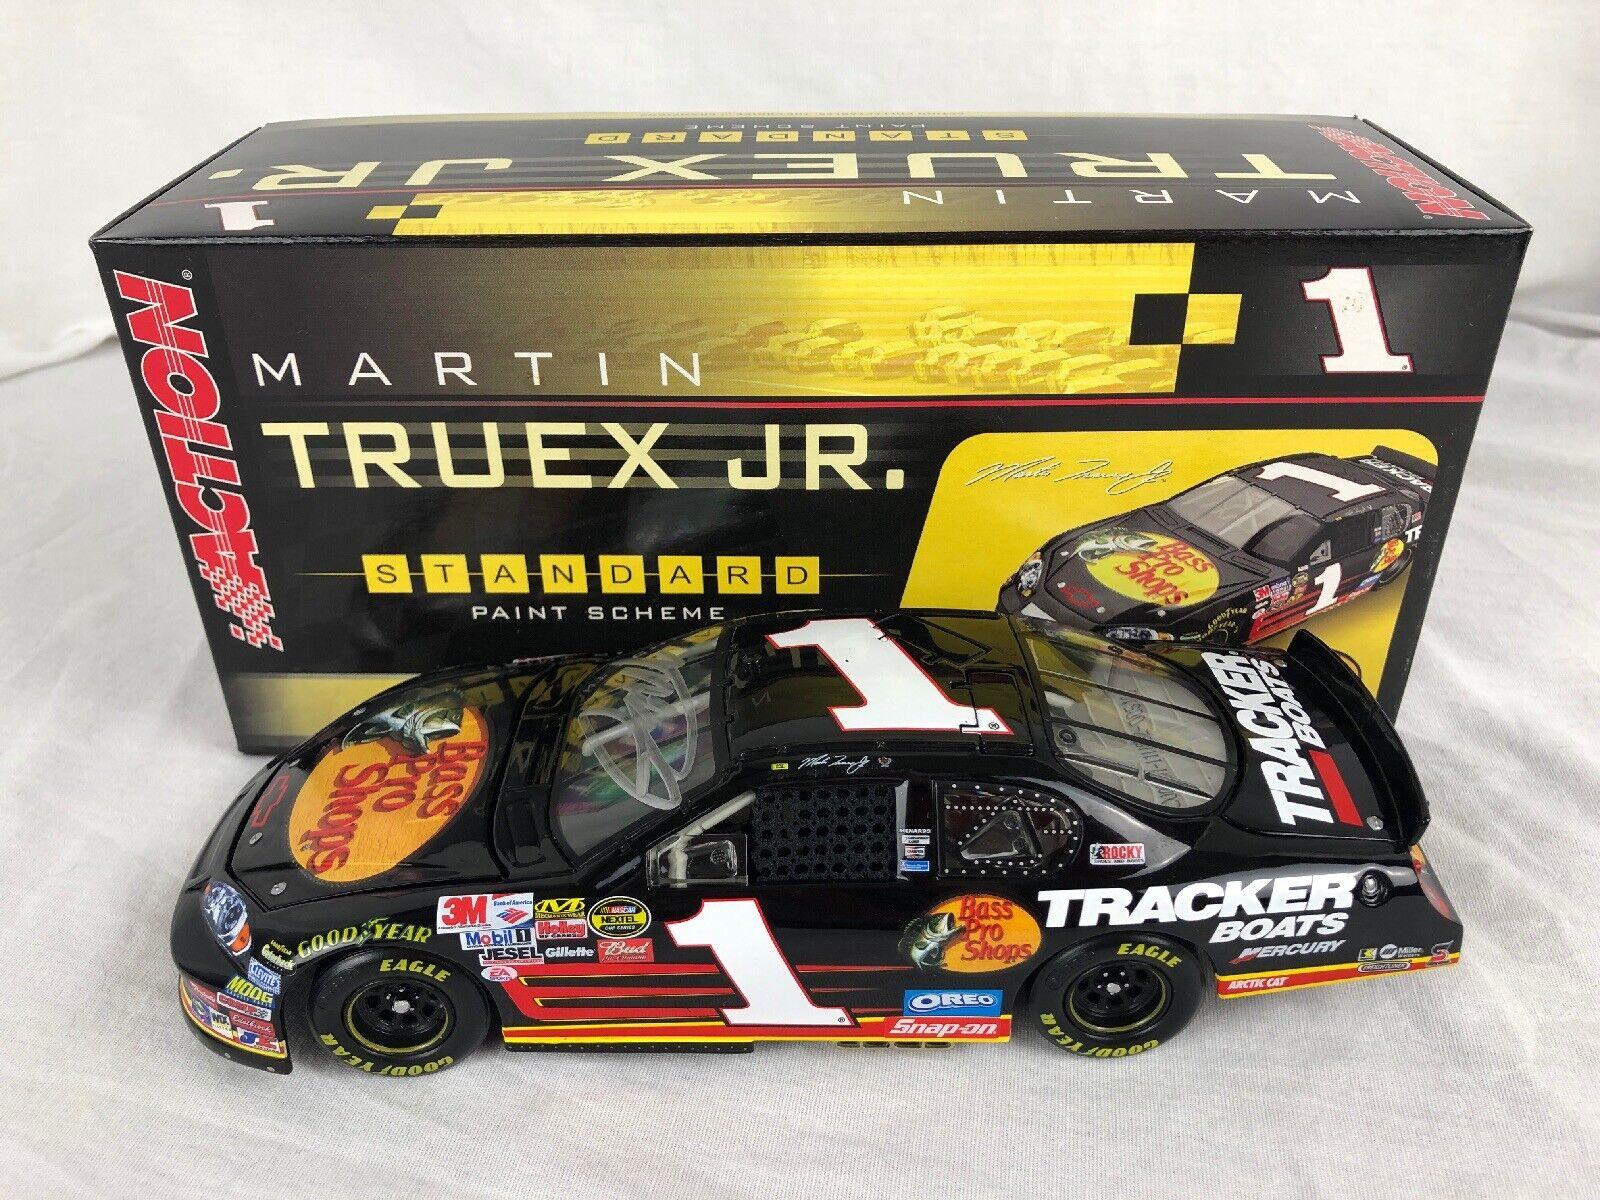 los clientes primero Acción de 2006 GM distribuidores distribuidores distribuidores Martin Truex Jr  1 autógrafo Bass Pro Shops 1 24 Diecast  mas barato